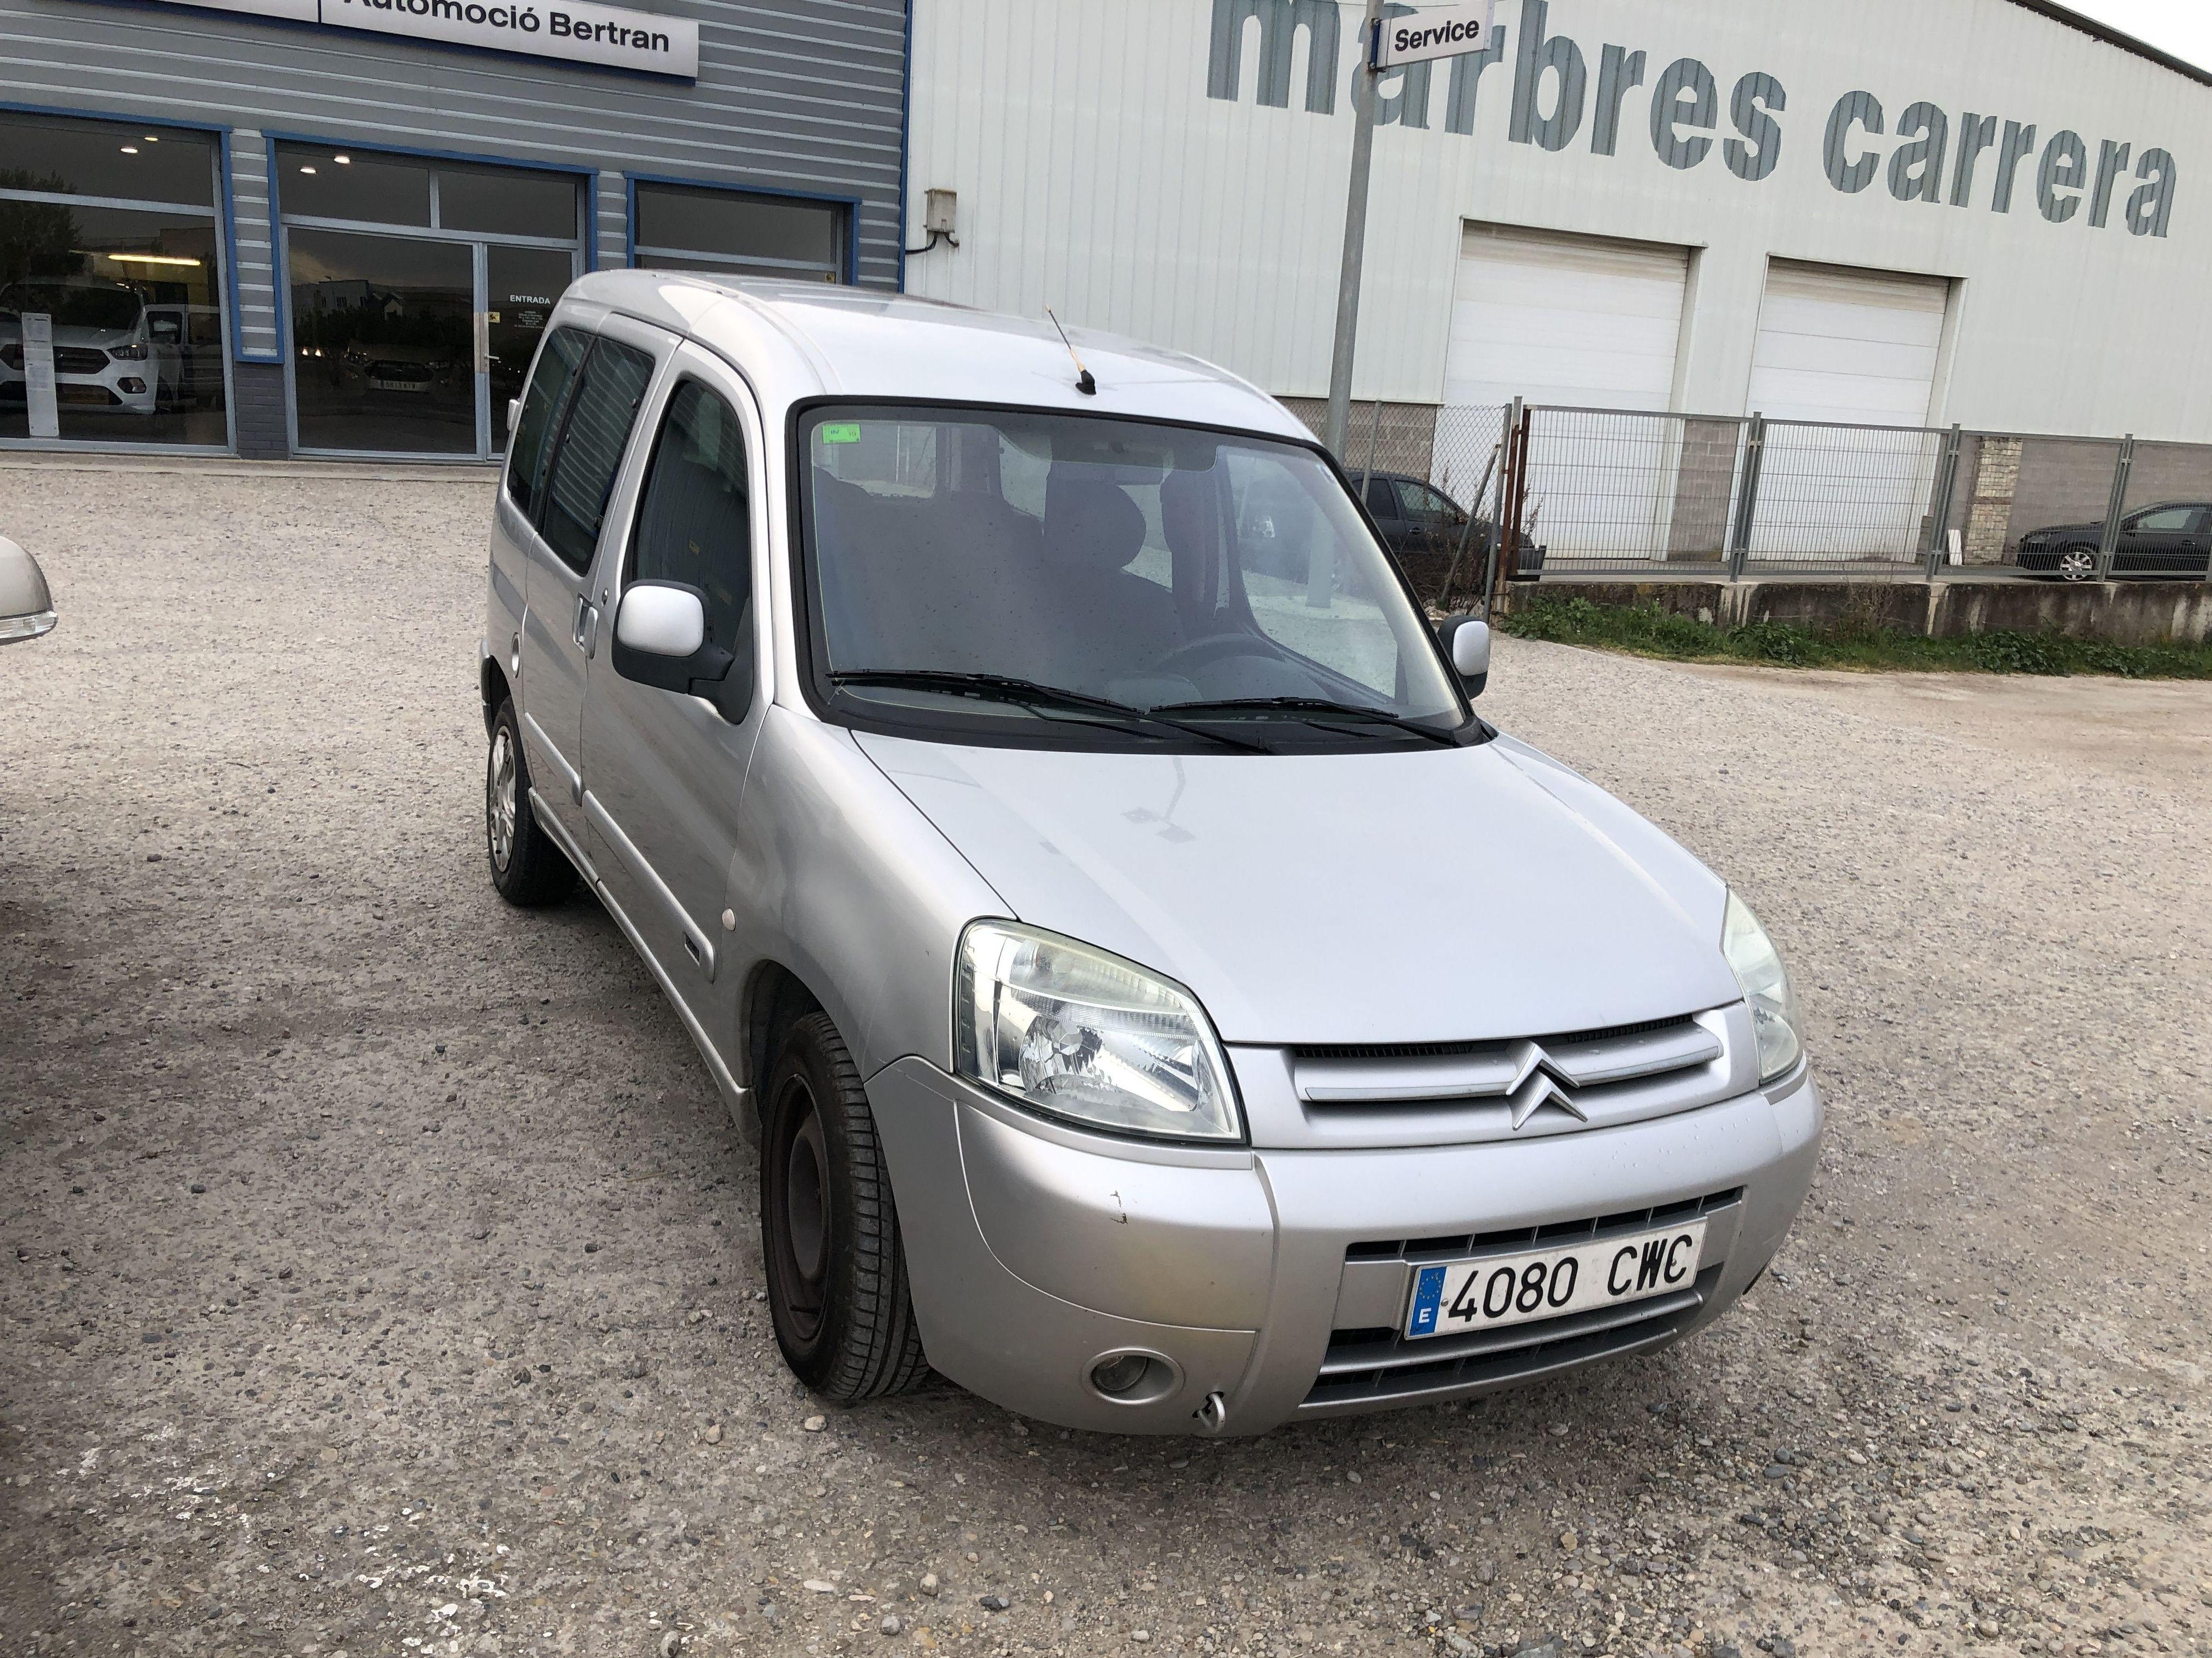 Citroen Berlingo )0cv hdi 2005 3500€: Coches Km 0 y de ocasión de Automoció Bertran S L